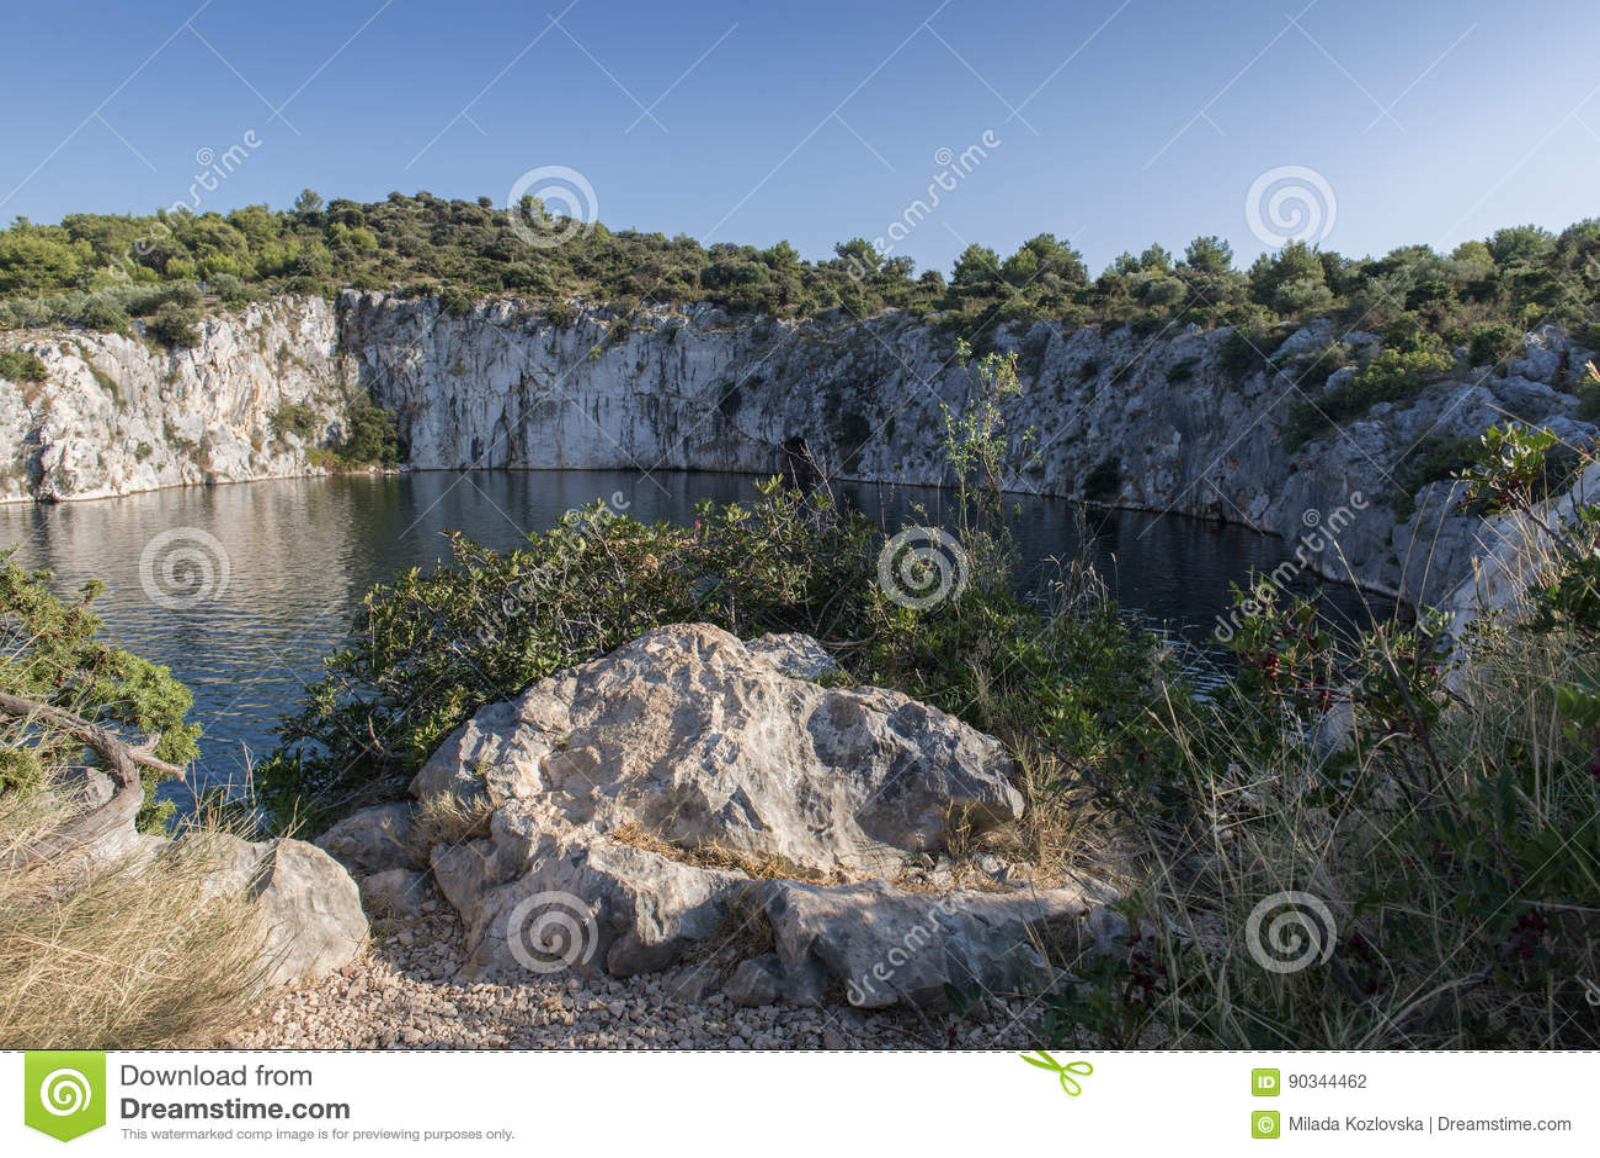 Dragon Eye-meer in Rogoznica, Kroatië